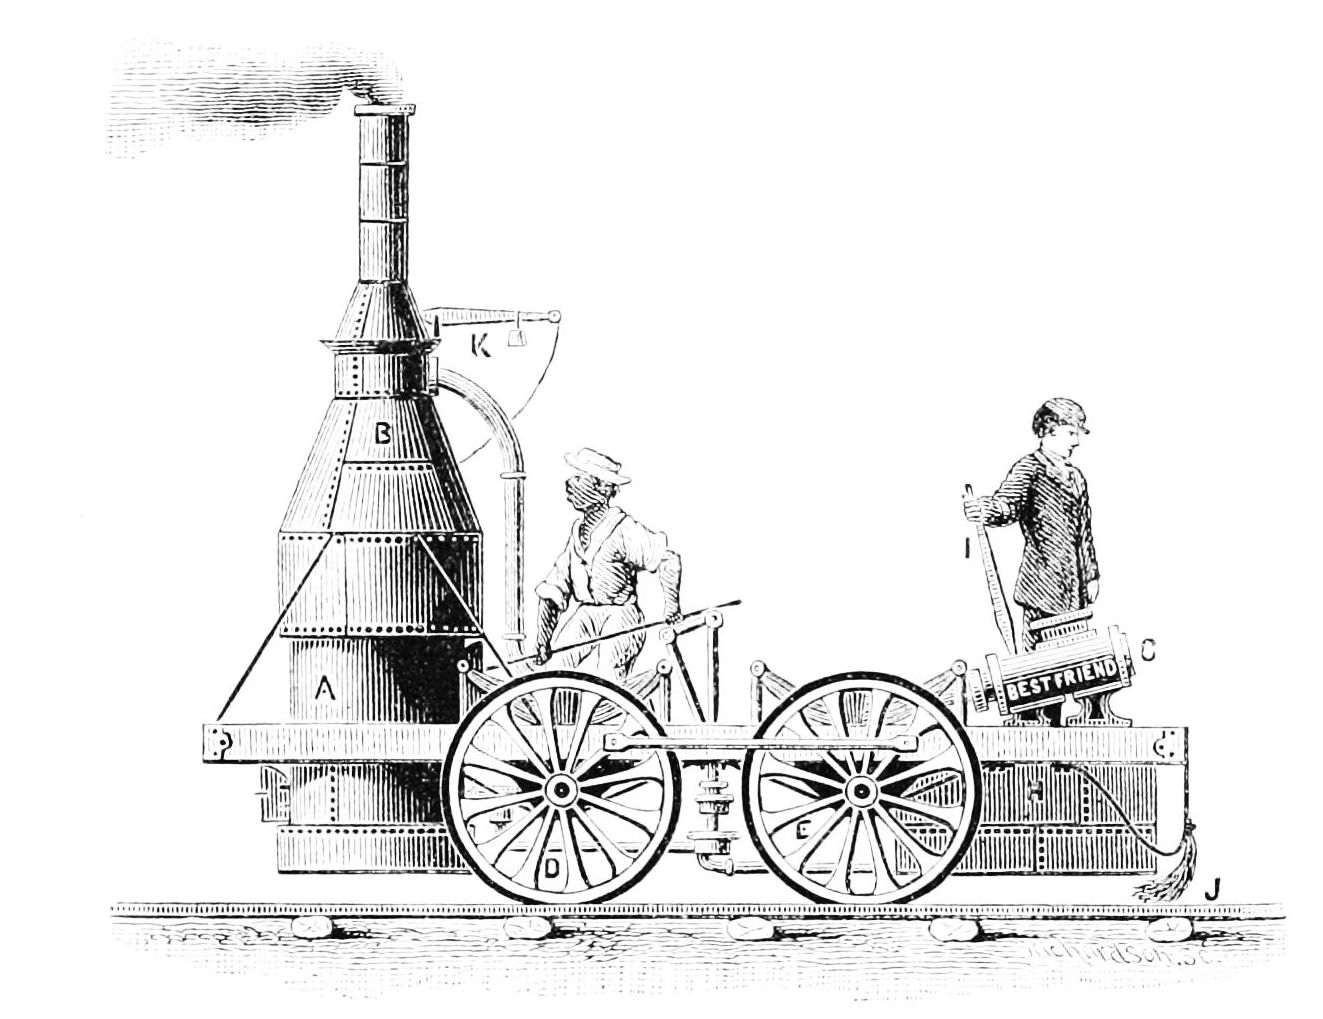 A Cronology Of Locomotives